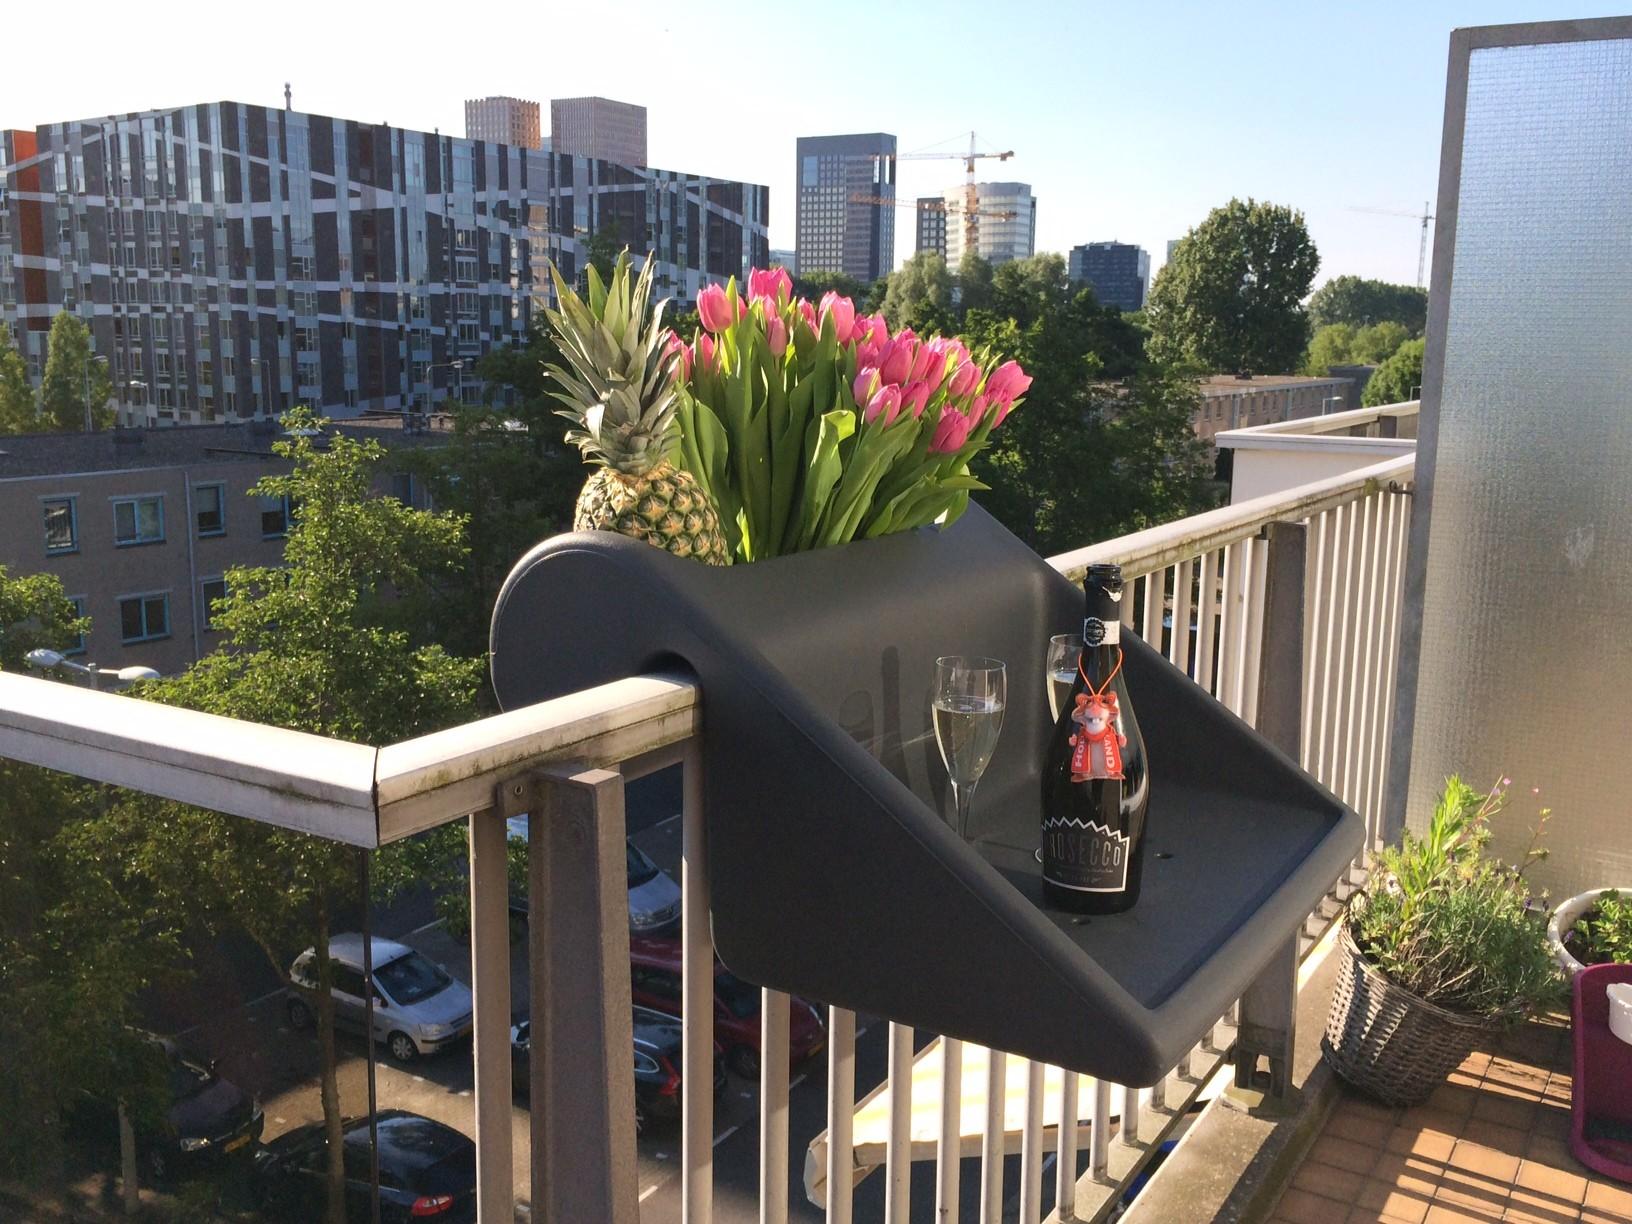 balkonzept gel ndertisch f r den kleinen balkon der design balkon the design balcony. Black Bedroom Furniture Sets. Home Design Ideas